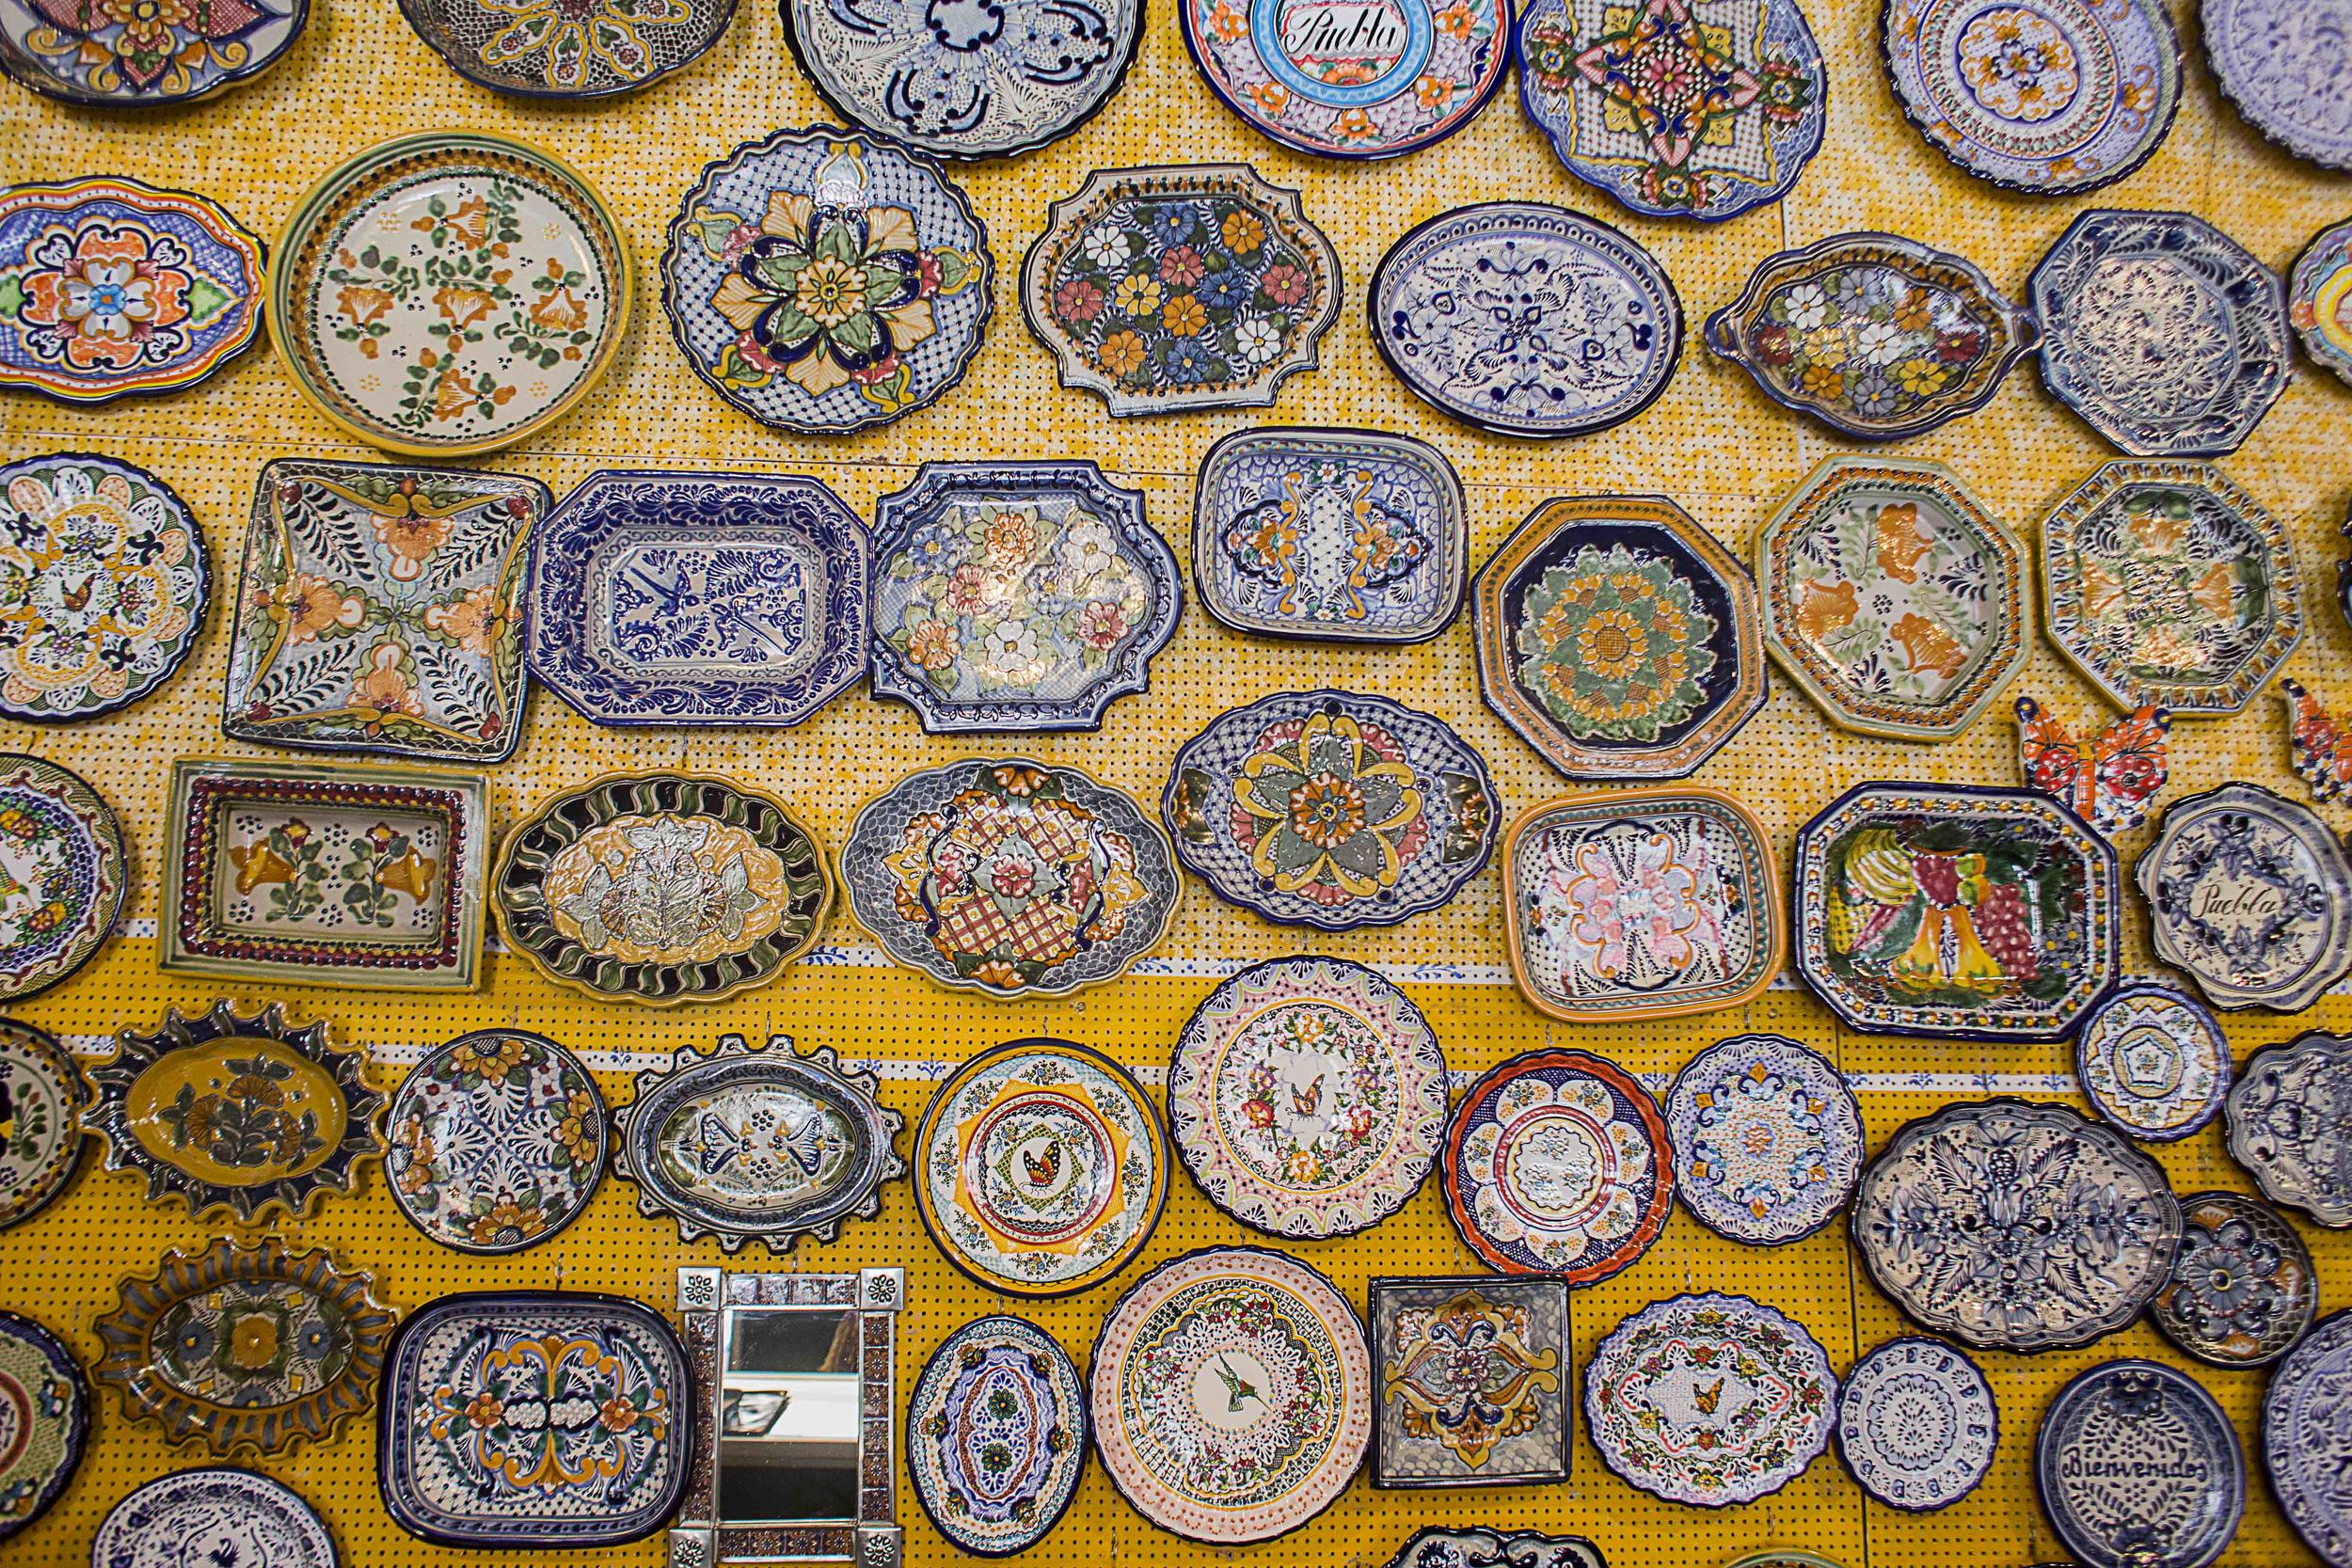 Day 99 - Puebla, Puebla, Mexico   A Talavera shop showcasing their many plates and designs.